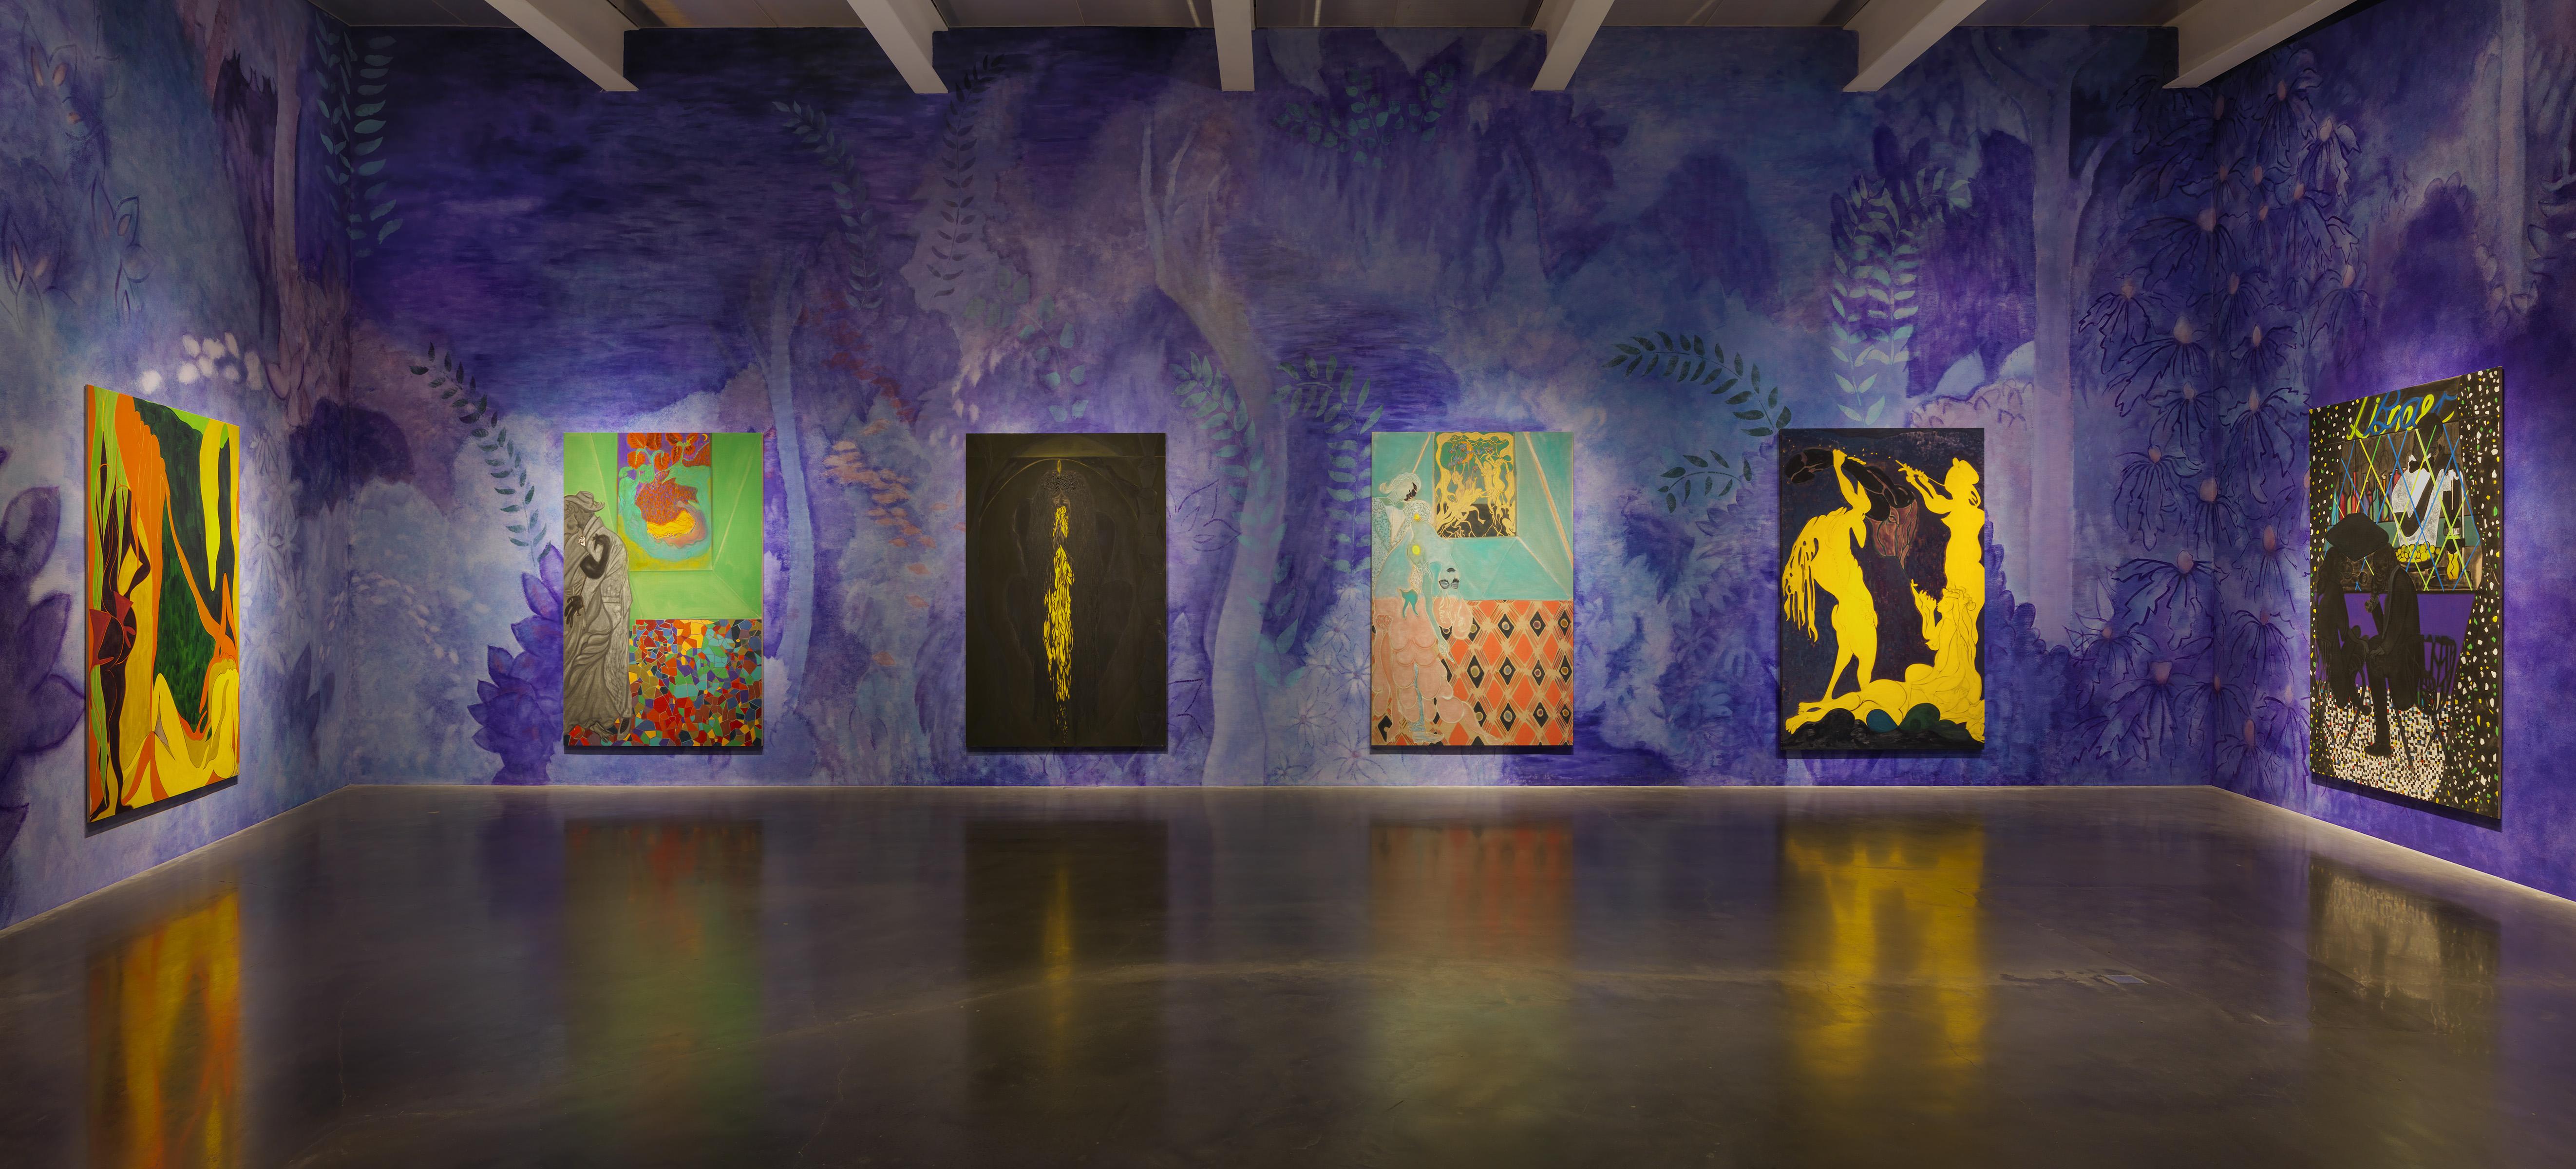 Art In Paradise D Exhibition Hall : Chris ofili david zwirner